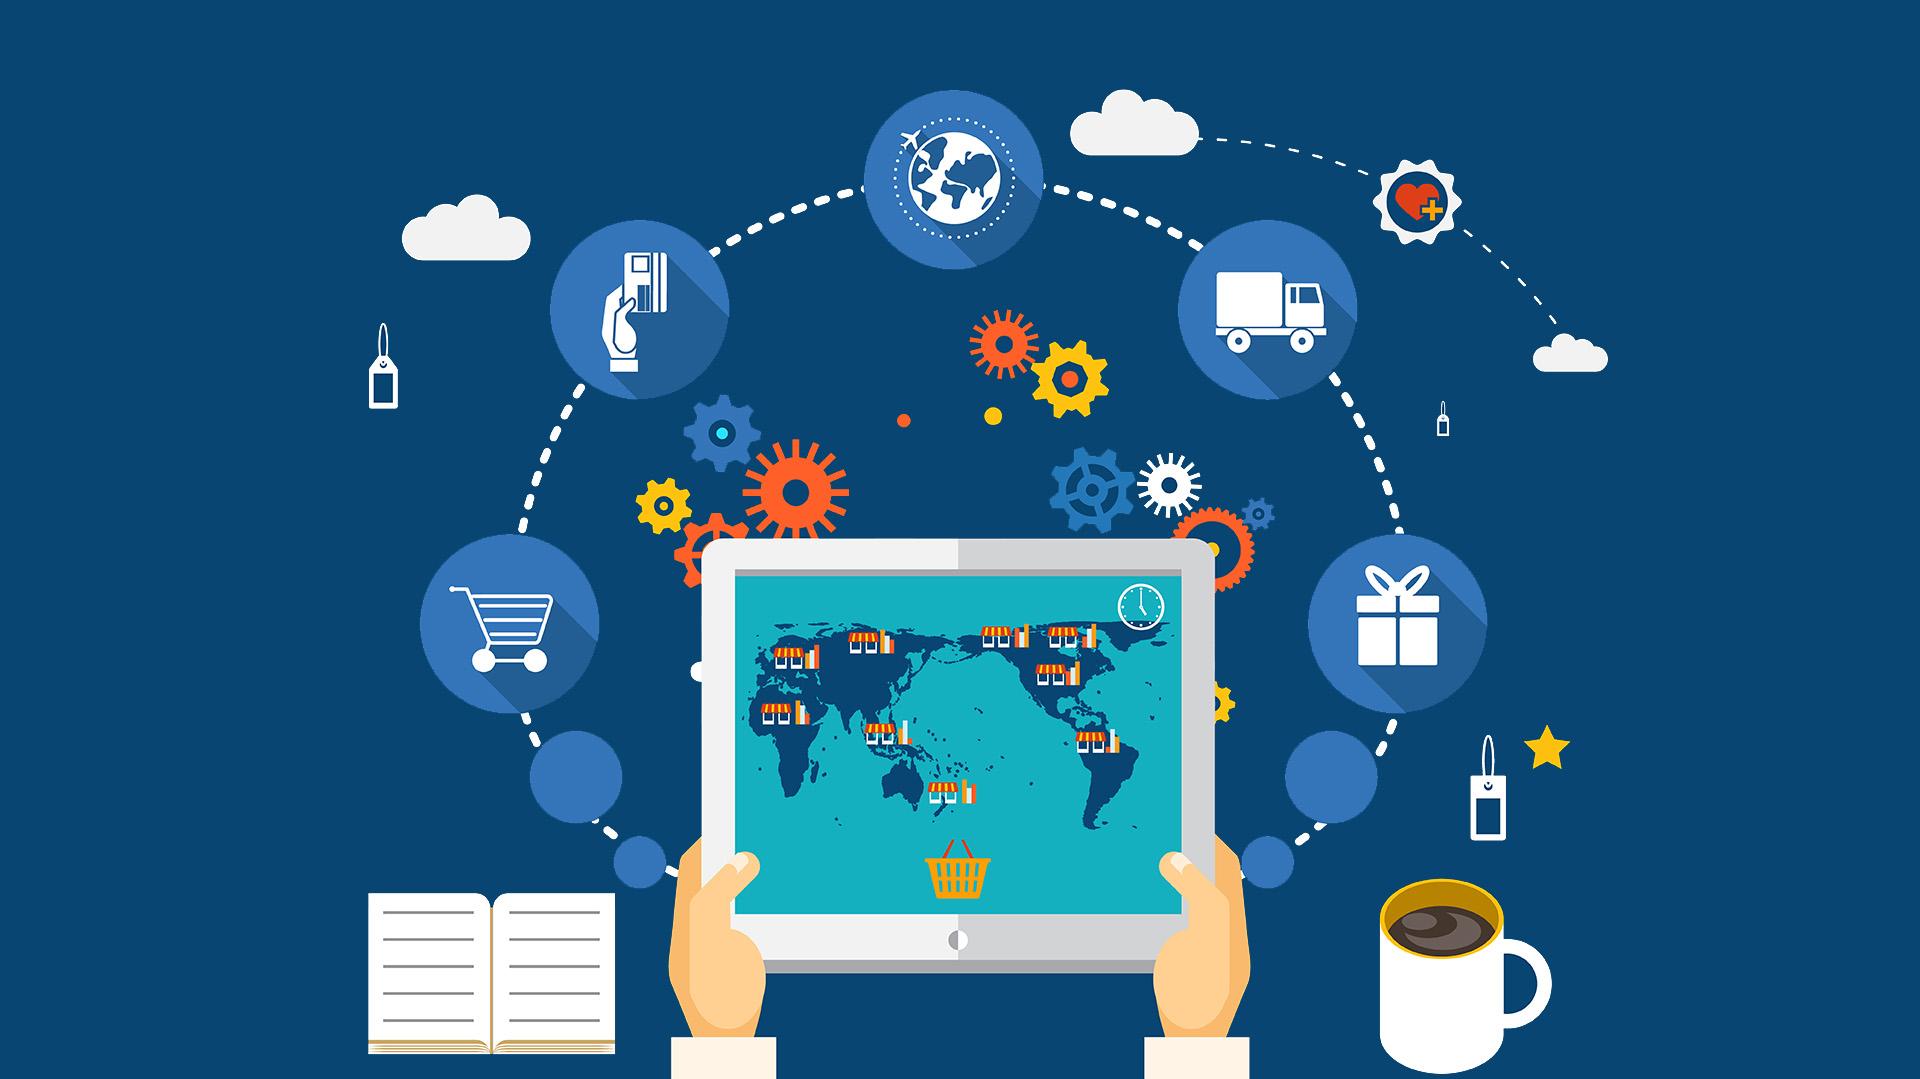 Wallpaper-2 - Blockchain Global Supply Chain (#1655886) - HD ...